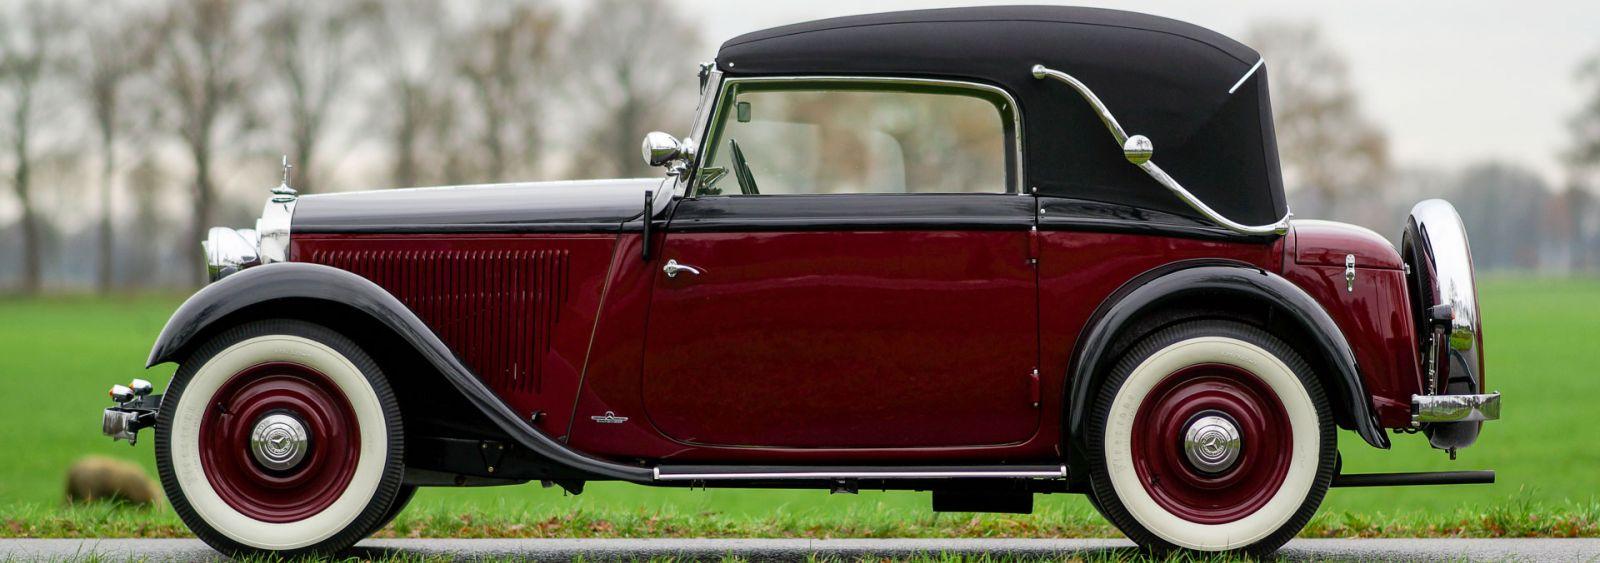 mercedes benz 200 w21 cabriolet 1933 welcome to. Black Bedroom Furniture Sets. Home Design Ideas